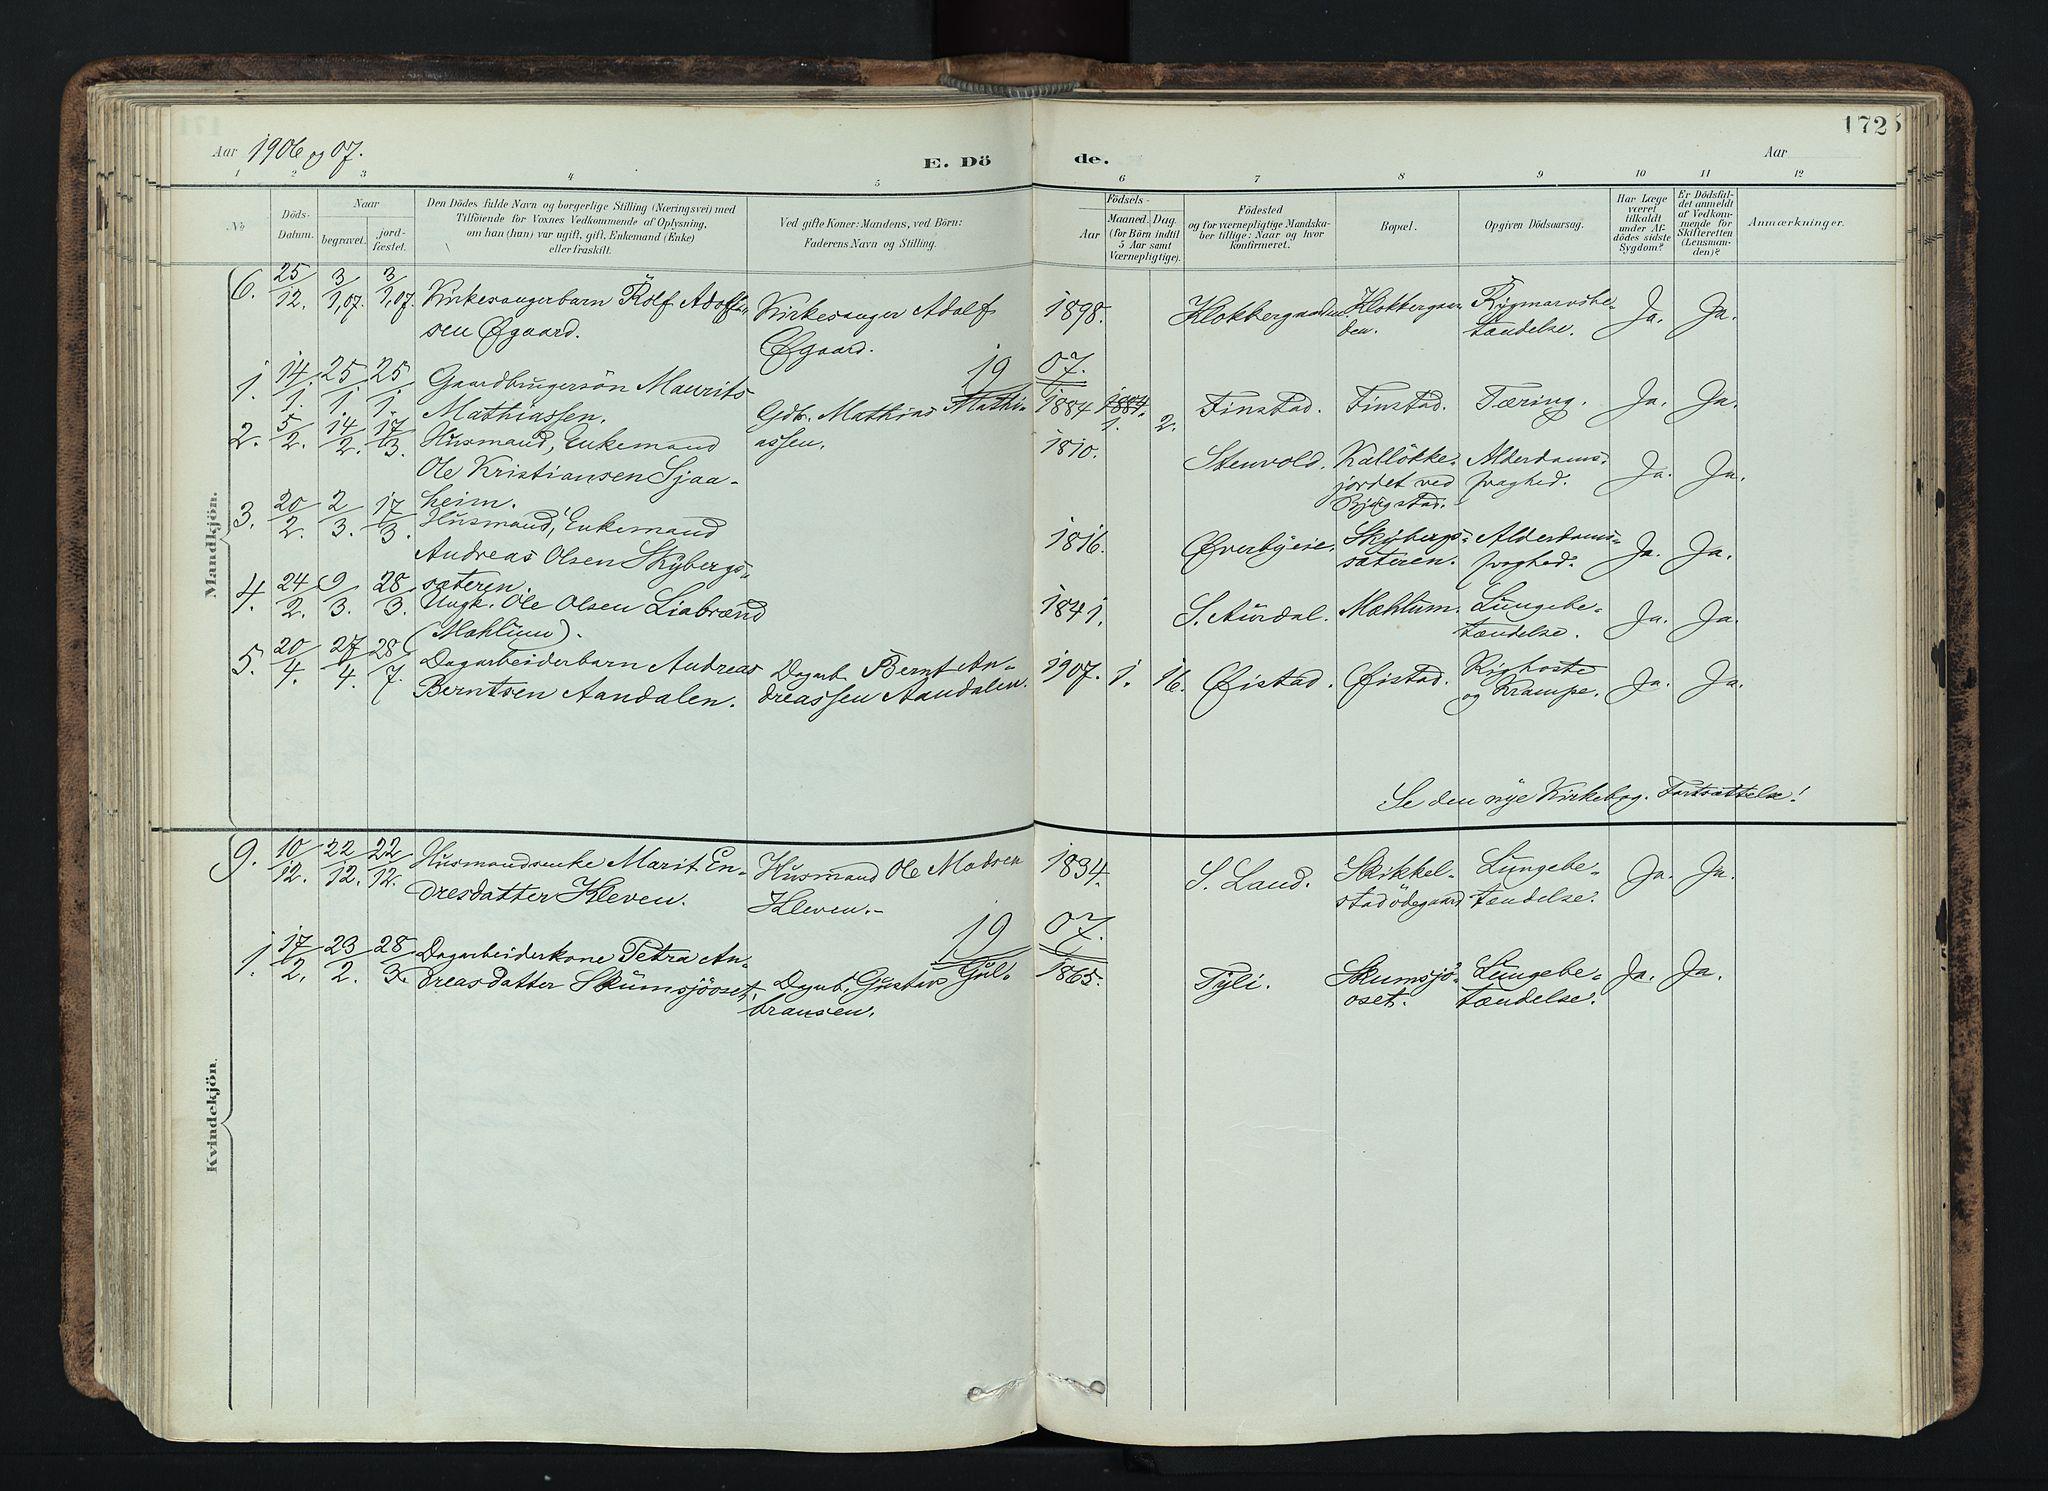 SAH, Vardal prestekontor, H/Ha/Haa/L0019: Ministerialbok nr. 19, 1893-1907, s. 172